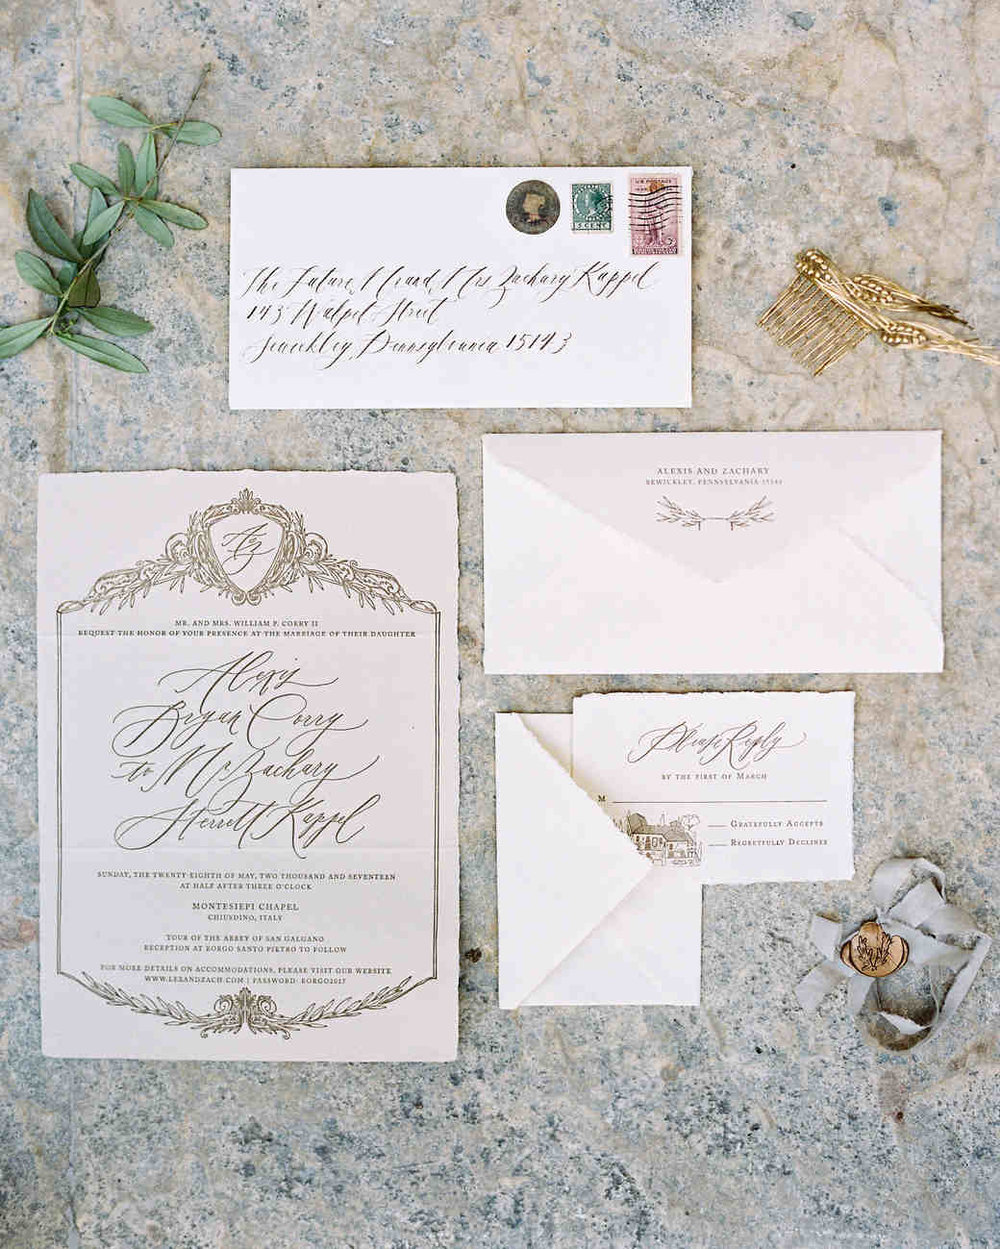 alexis-zach-wedding-italy-invitation-12815_05-6419608-1117_vert.jpg